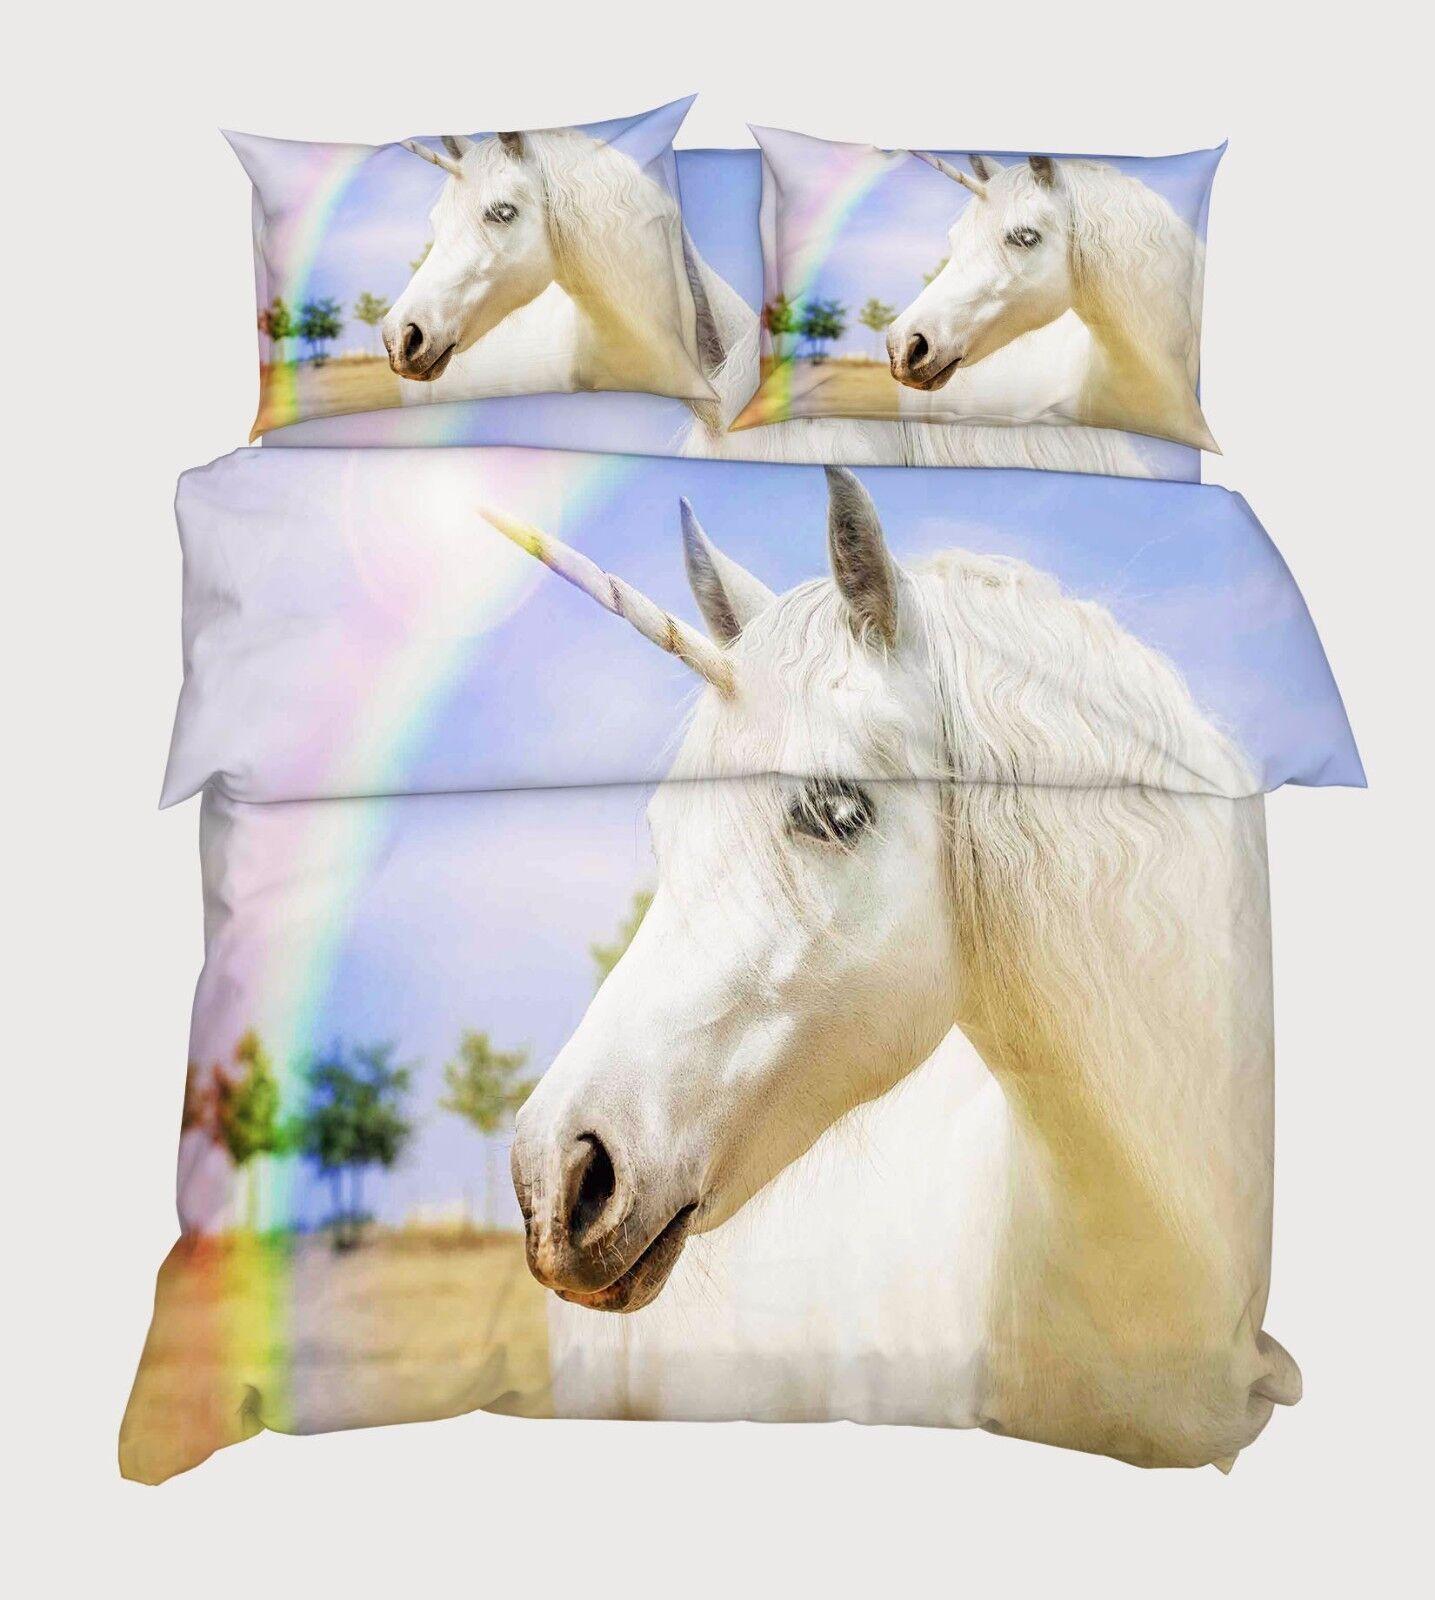 3D Weiß Unicorn 876 Bed Pillowcases Quilt Duvet Cover Set Single Queen UK Kyra